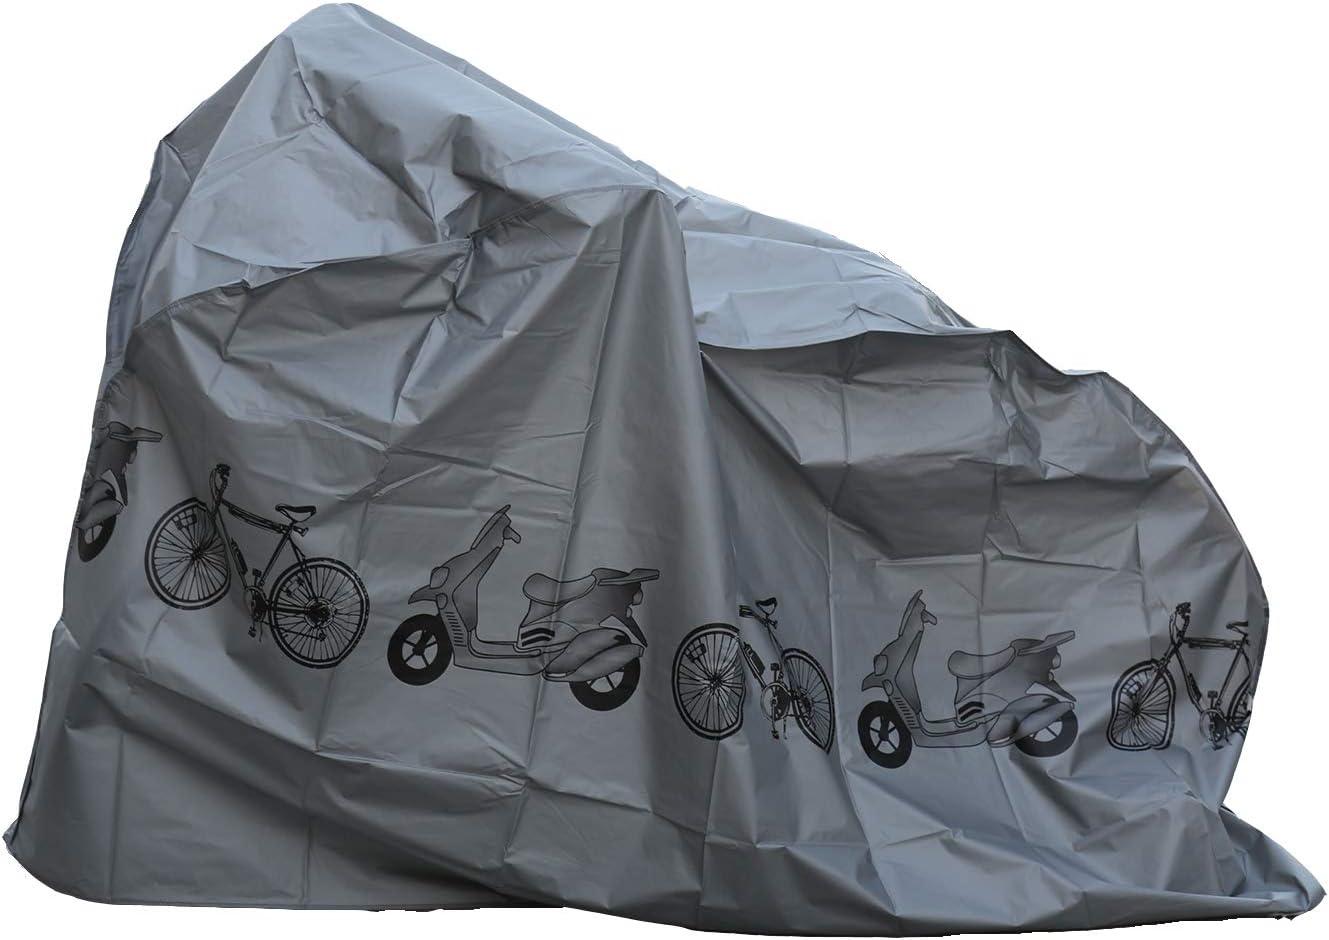 Universal Waterproof Nylon Bicycle Cycle Bike Cover Outdoor Rain Dust Protector